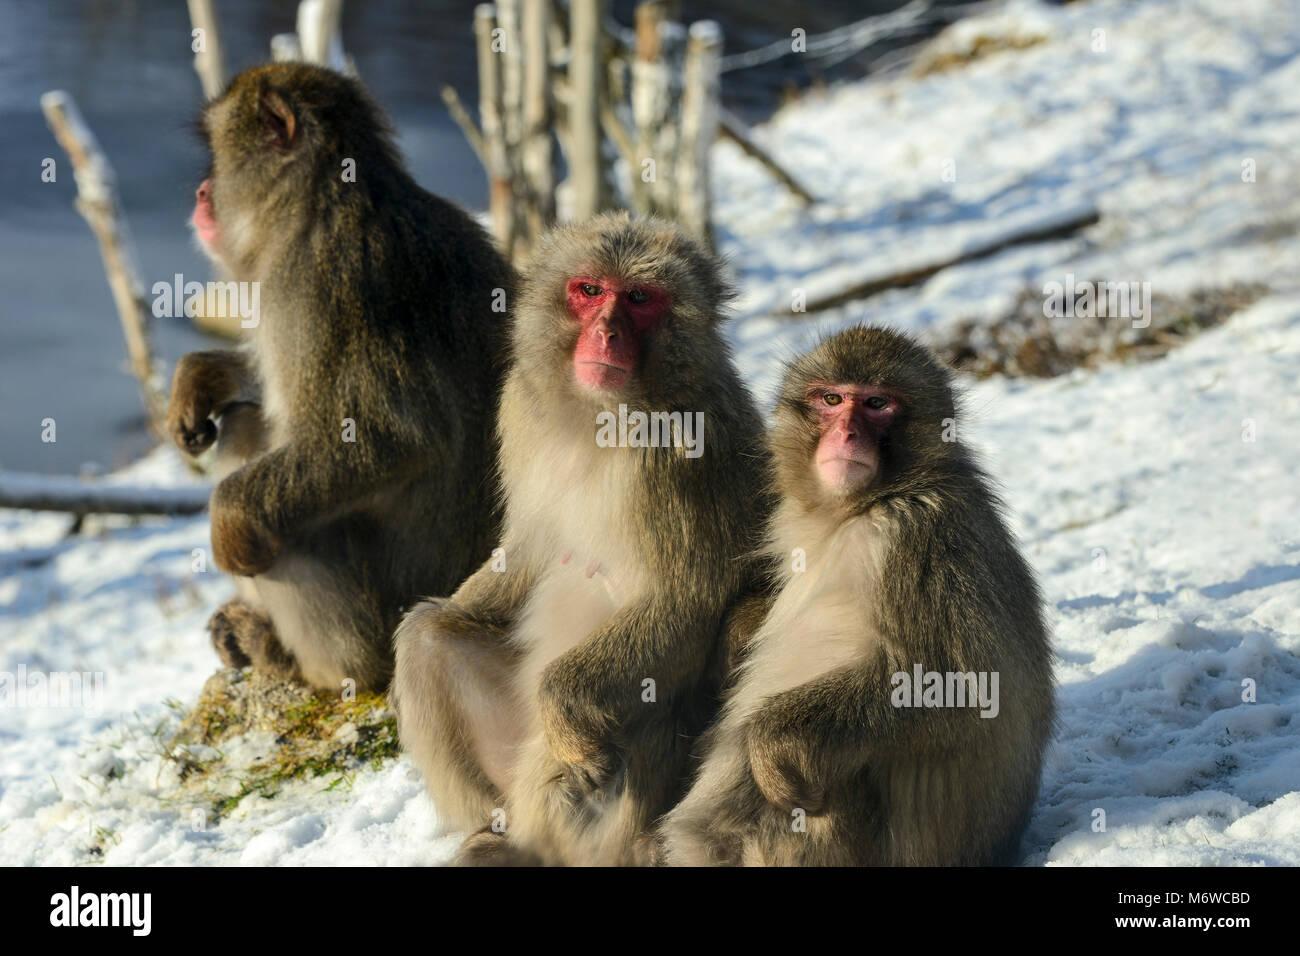 Japanese Macaques or Snow Monkeys (Macaca fuscata) at Highland Wildlife Park, Kincraig, Kingussie, Scotland, UK - Stock Image